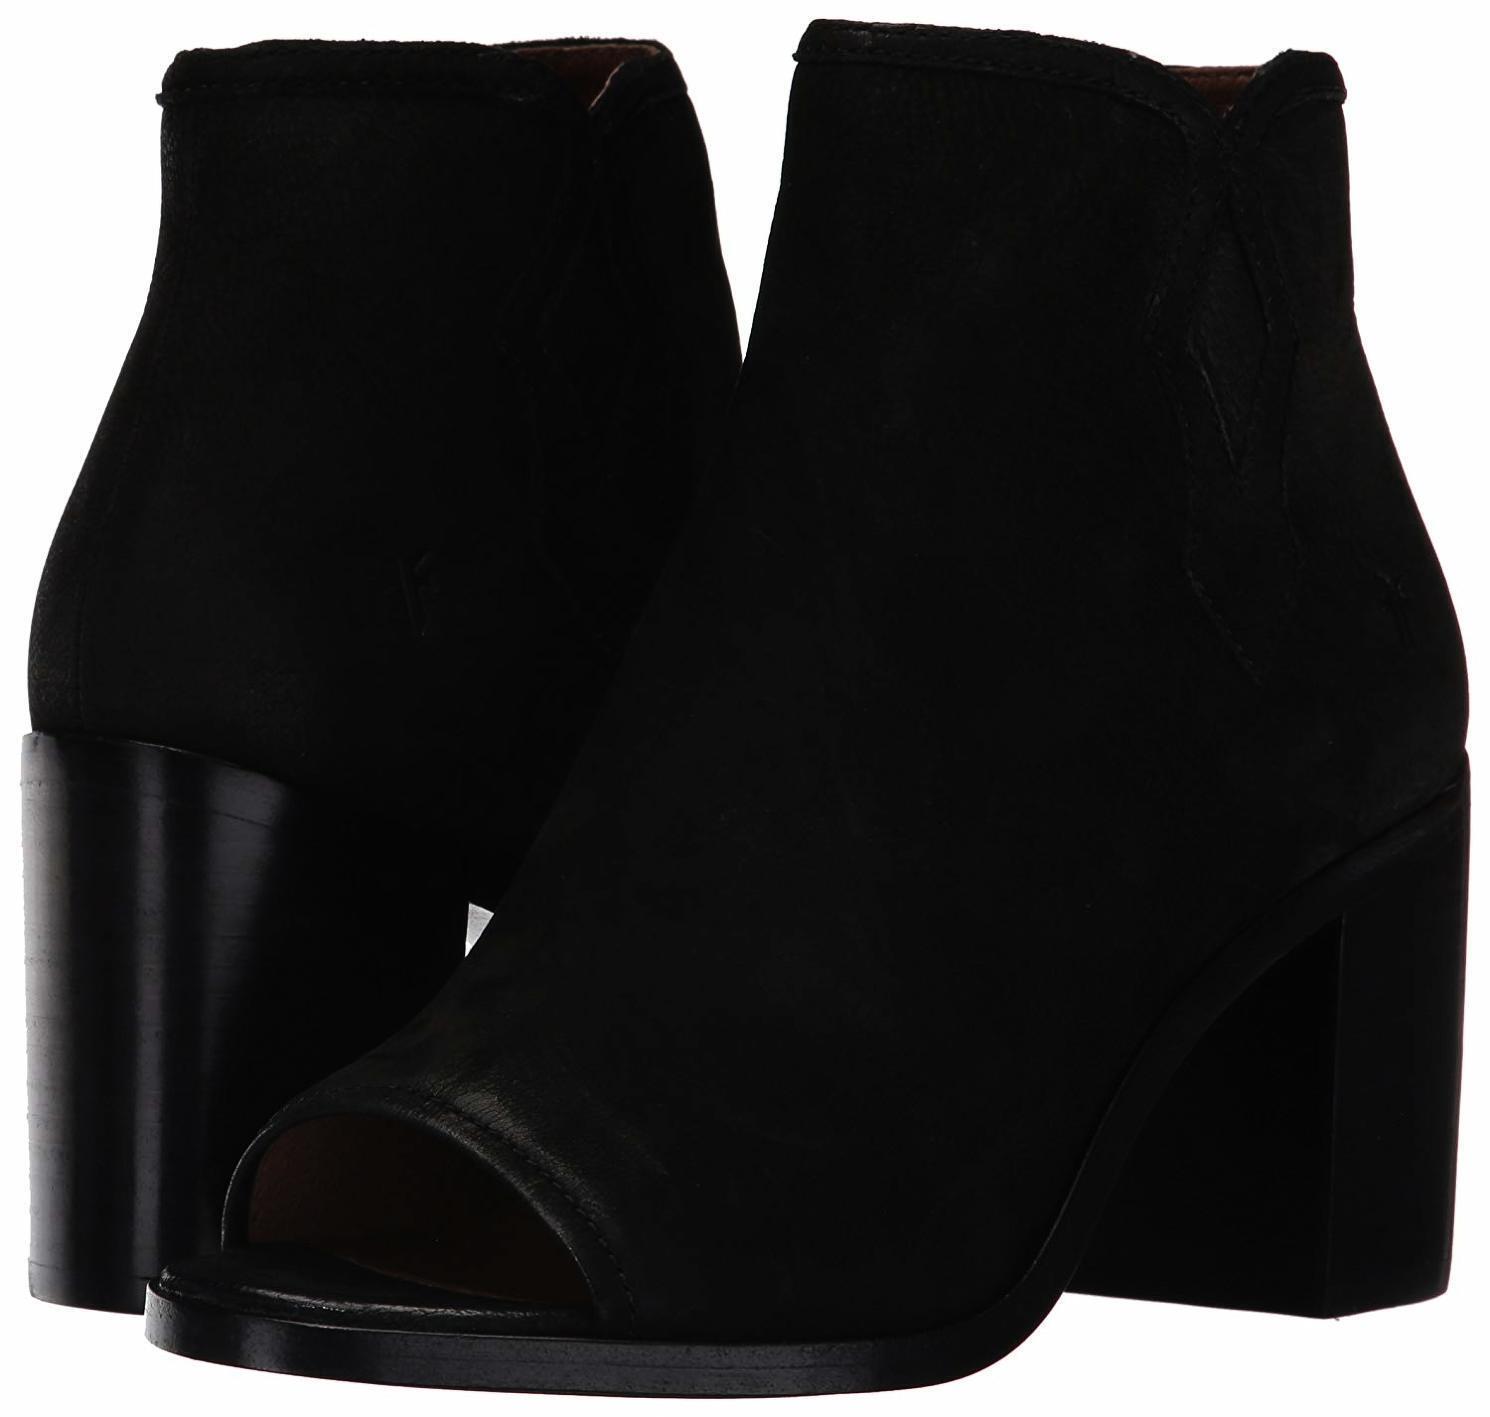 Frye para para para mujer Danica Peep Toe botaie botas Negro Nubuck 7.5 Nuevo En Caja  alta calidad